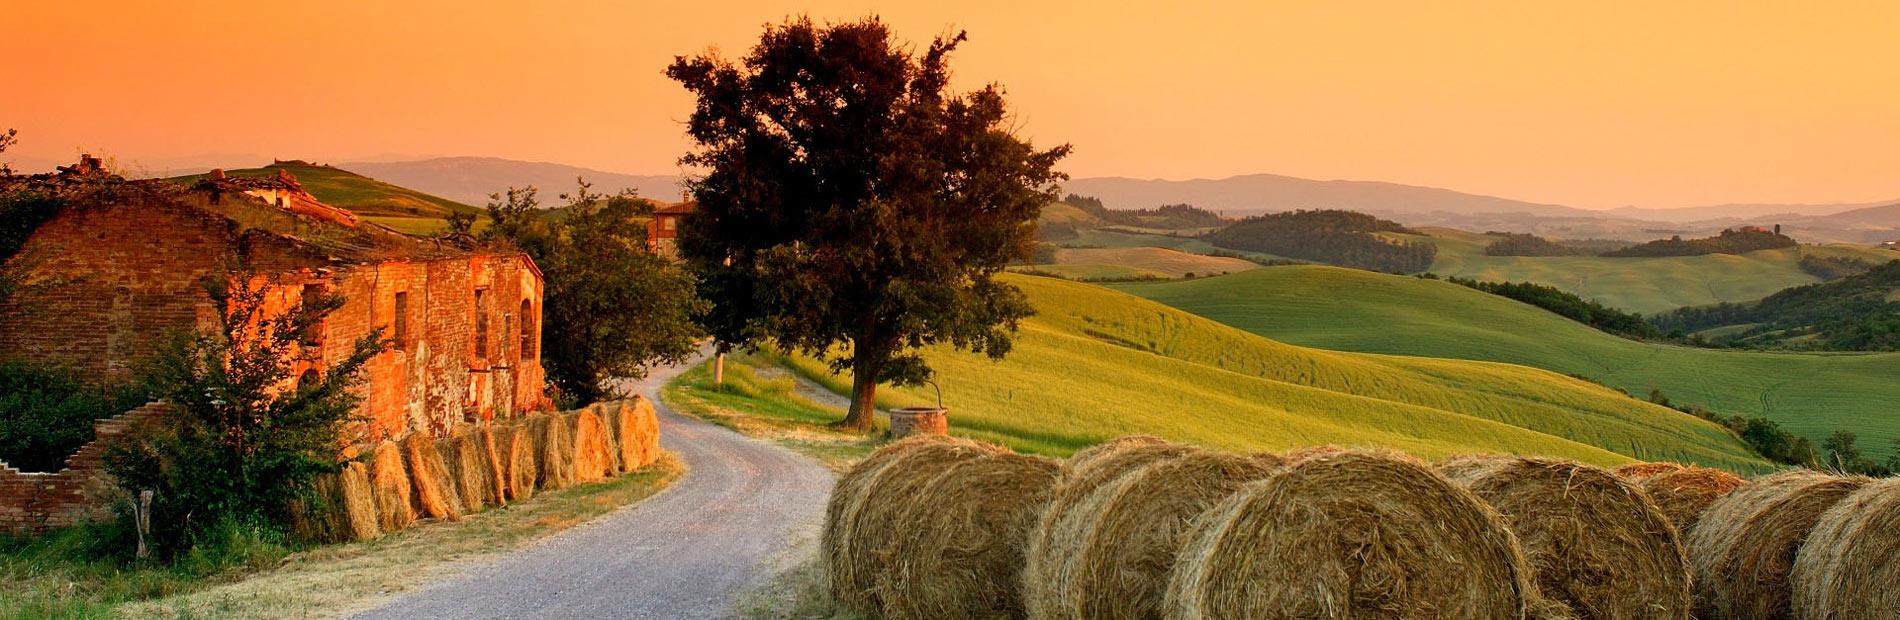 Villas-in-tuscany